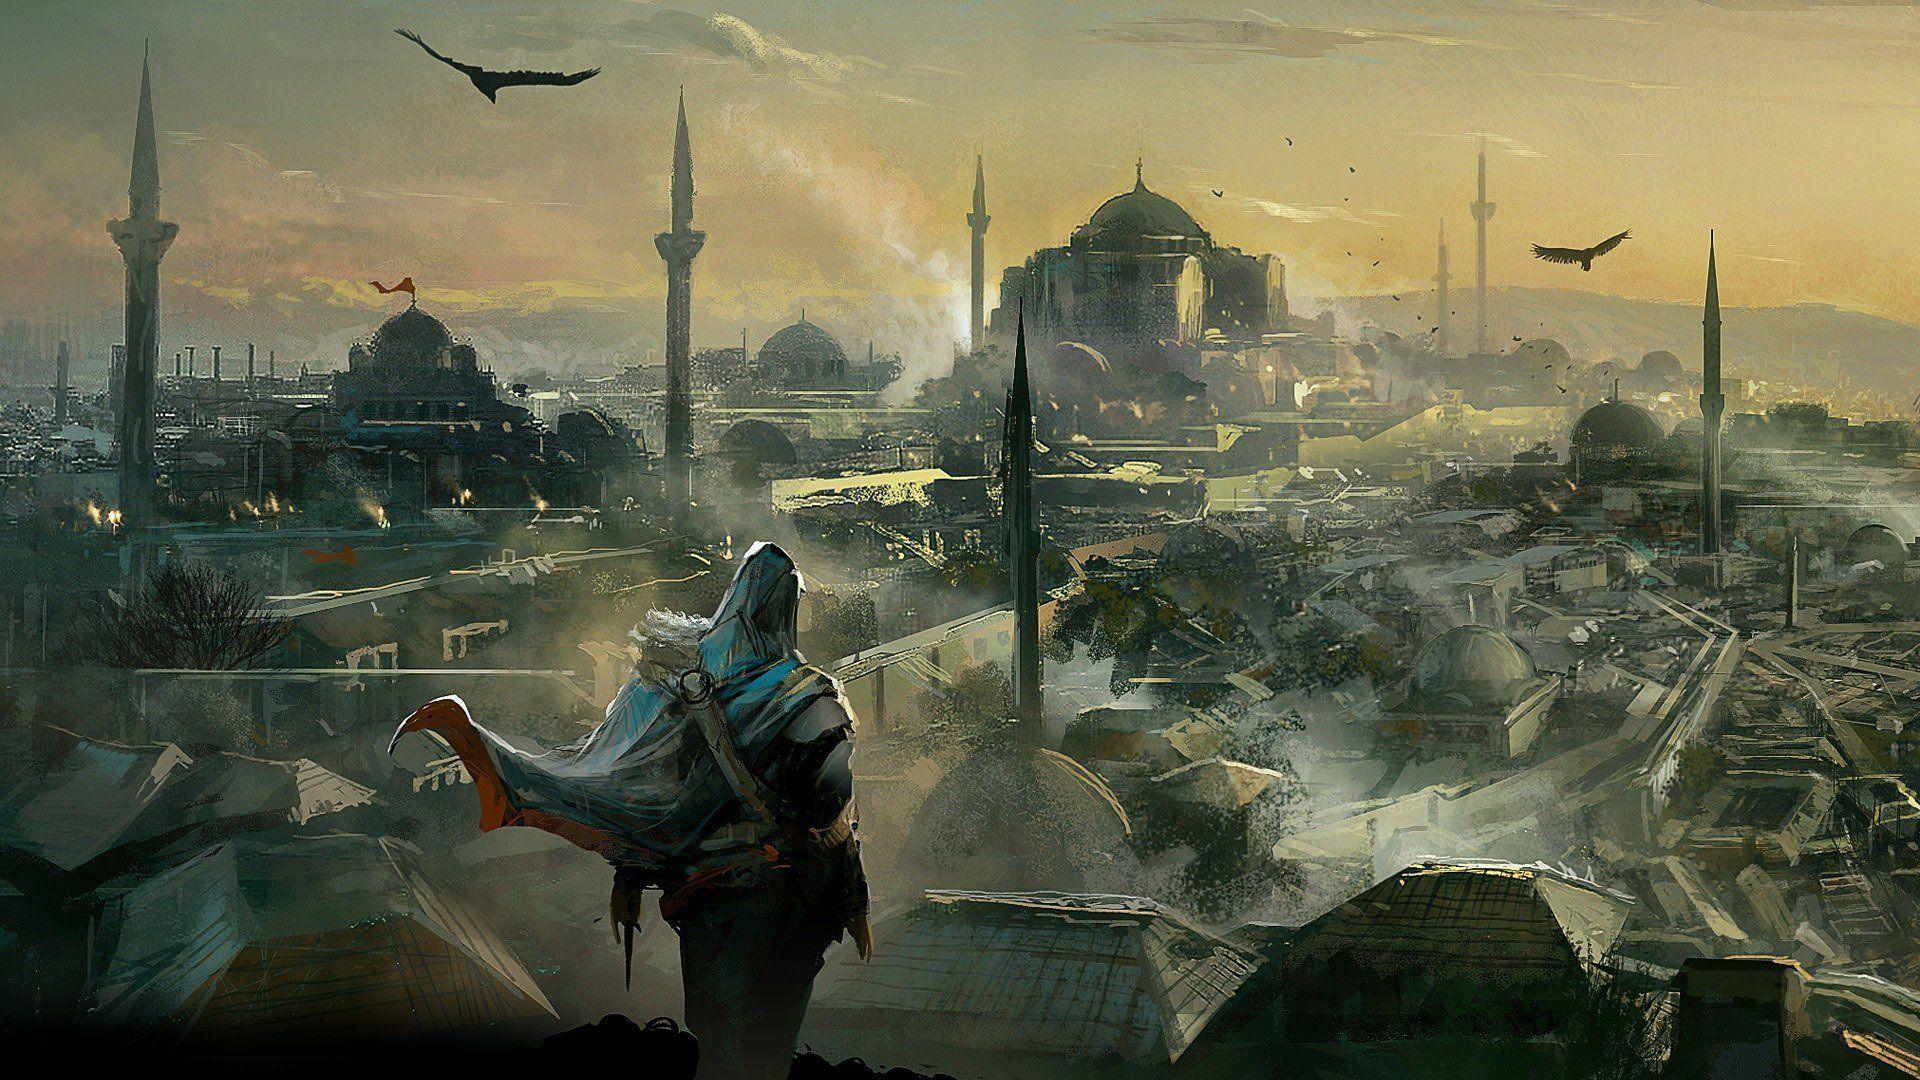 Assassins Creed Revelations Concept Art Hd Desktop Wallpaper Assassins Creed Art Assassins Creed Assassin S Creed Wallpaper